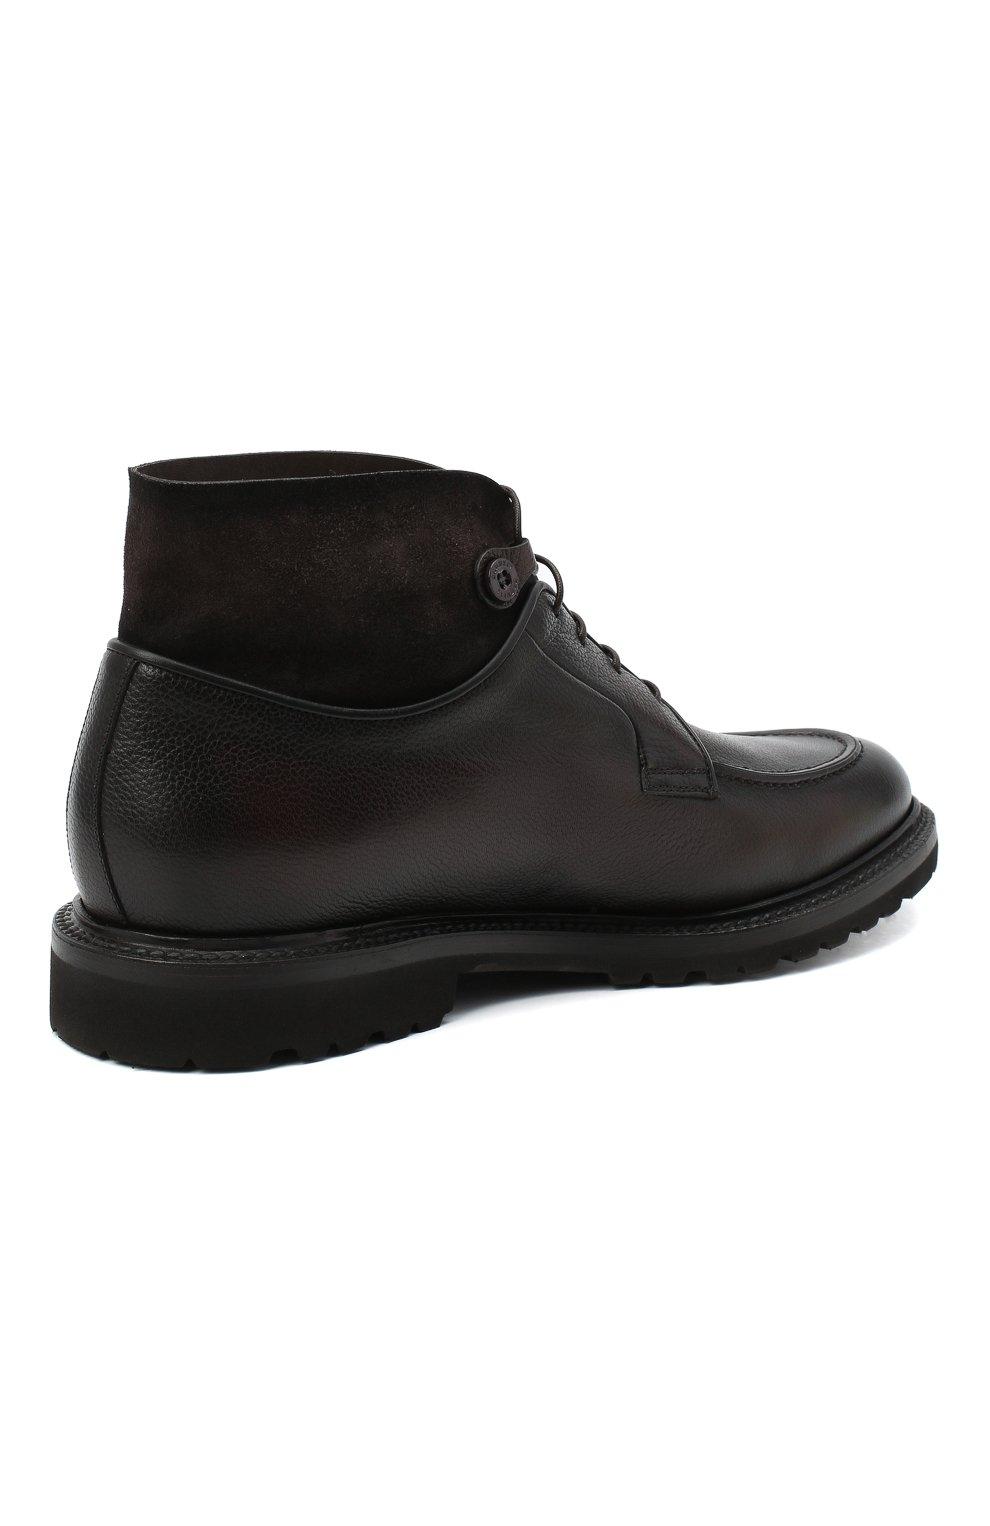 Мужские кожаные ботинки BARRETT темно-коричневого цвета, арт. 192U026.8/RAIDER   Фото 4